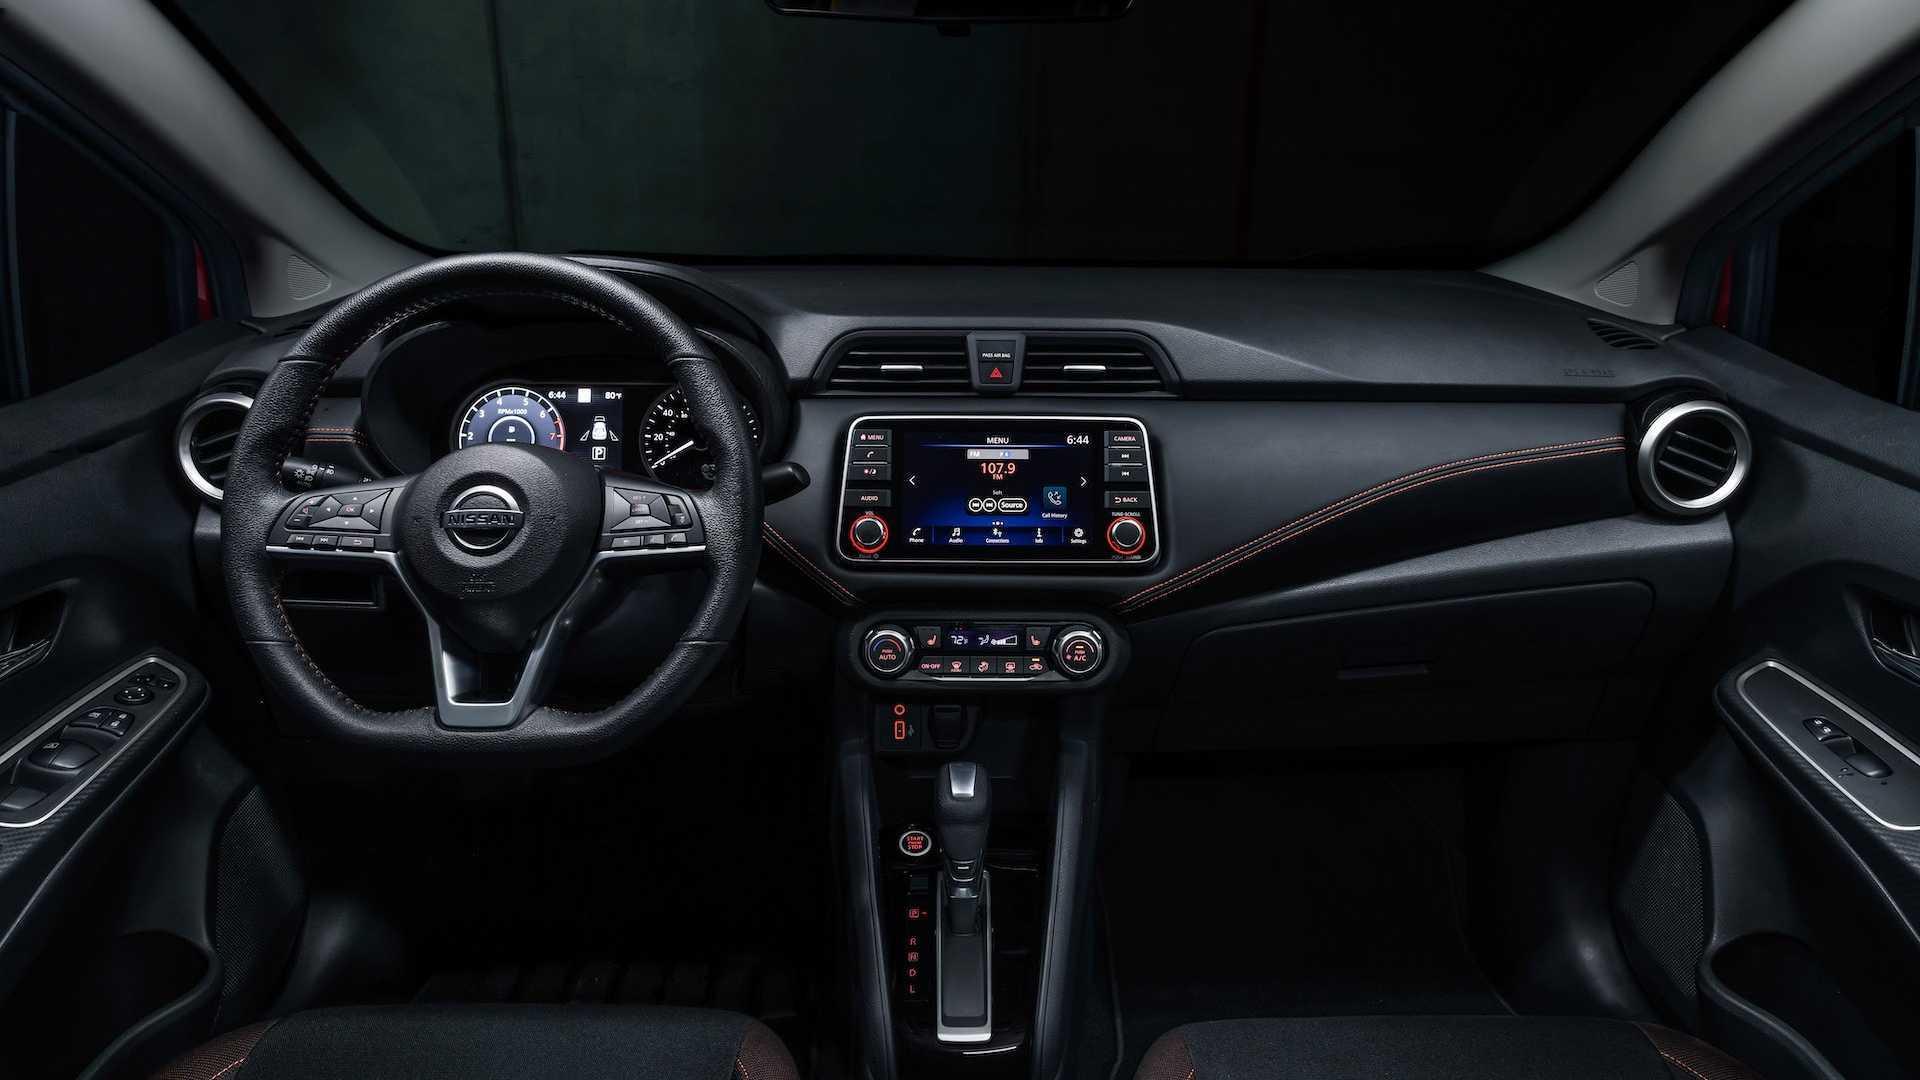 Nissan Versa 2020 - Primeiras impressões